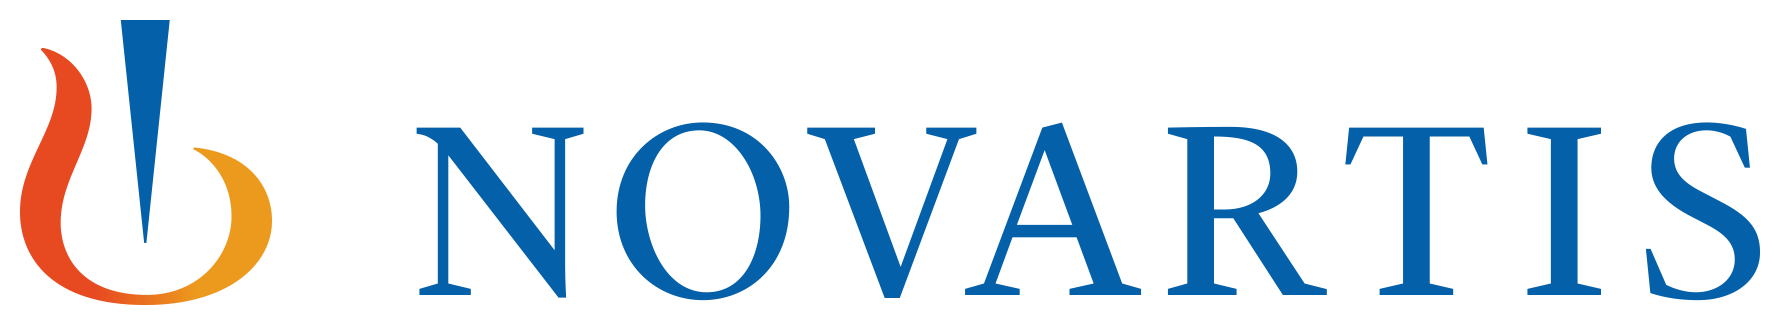 Job offers of Novartis at Europe Language Jobs